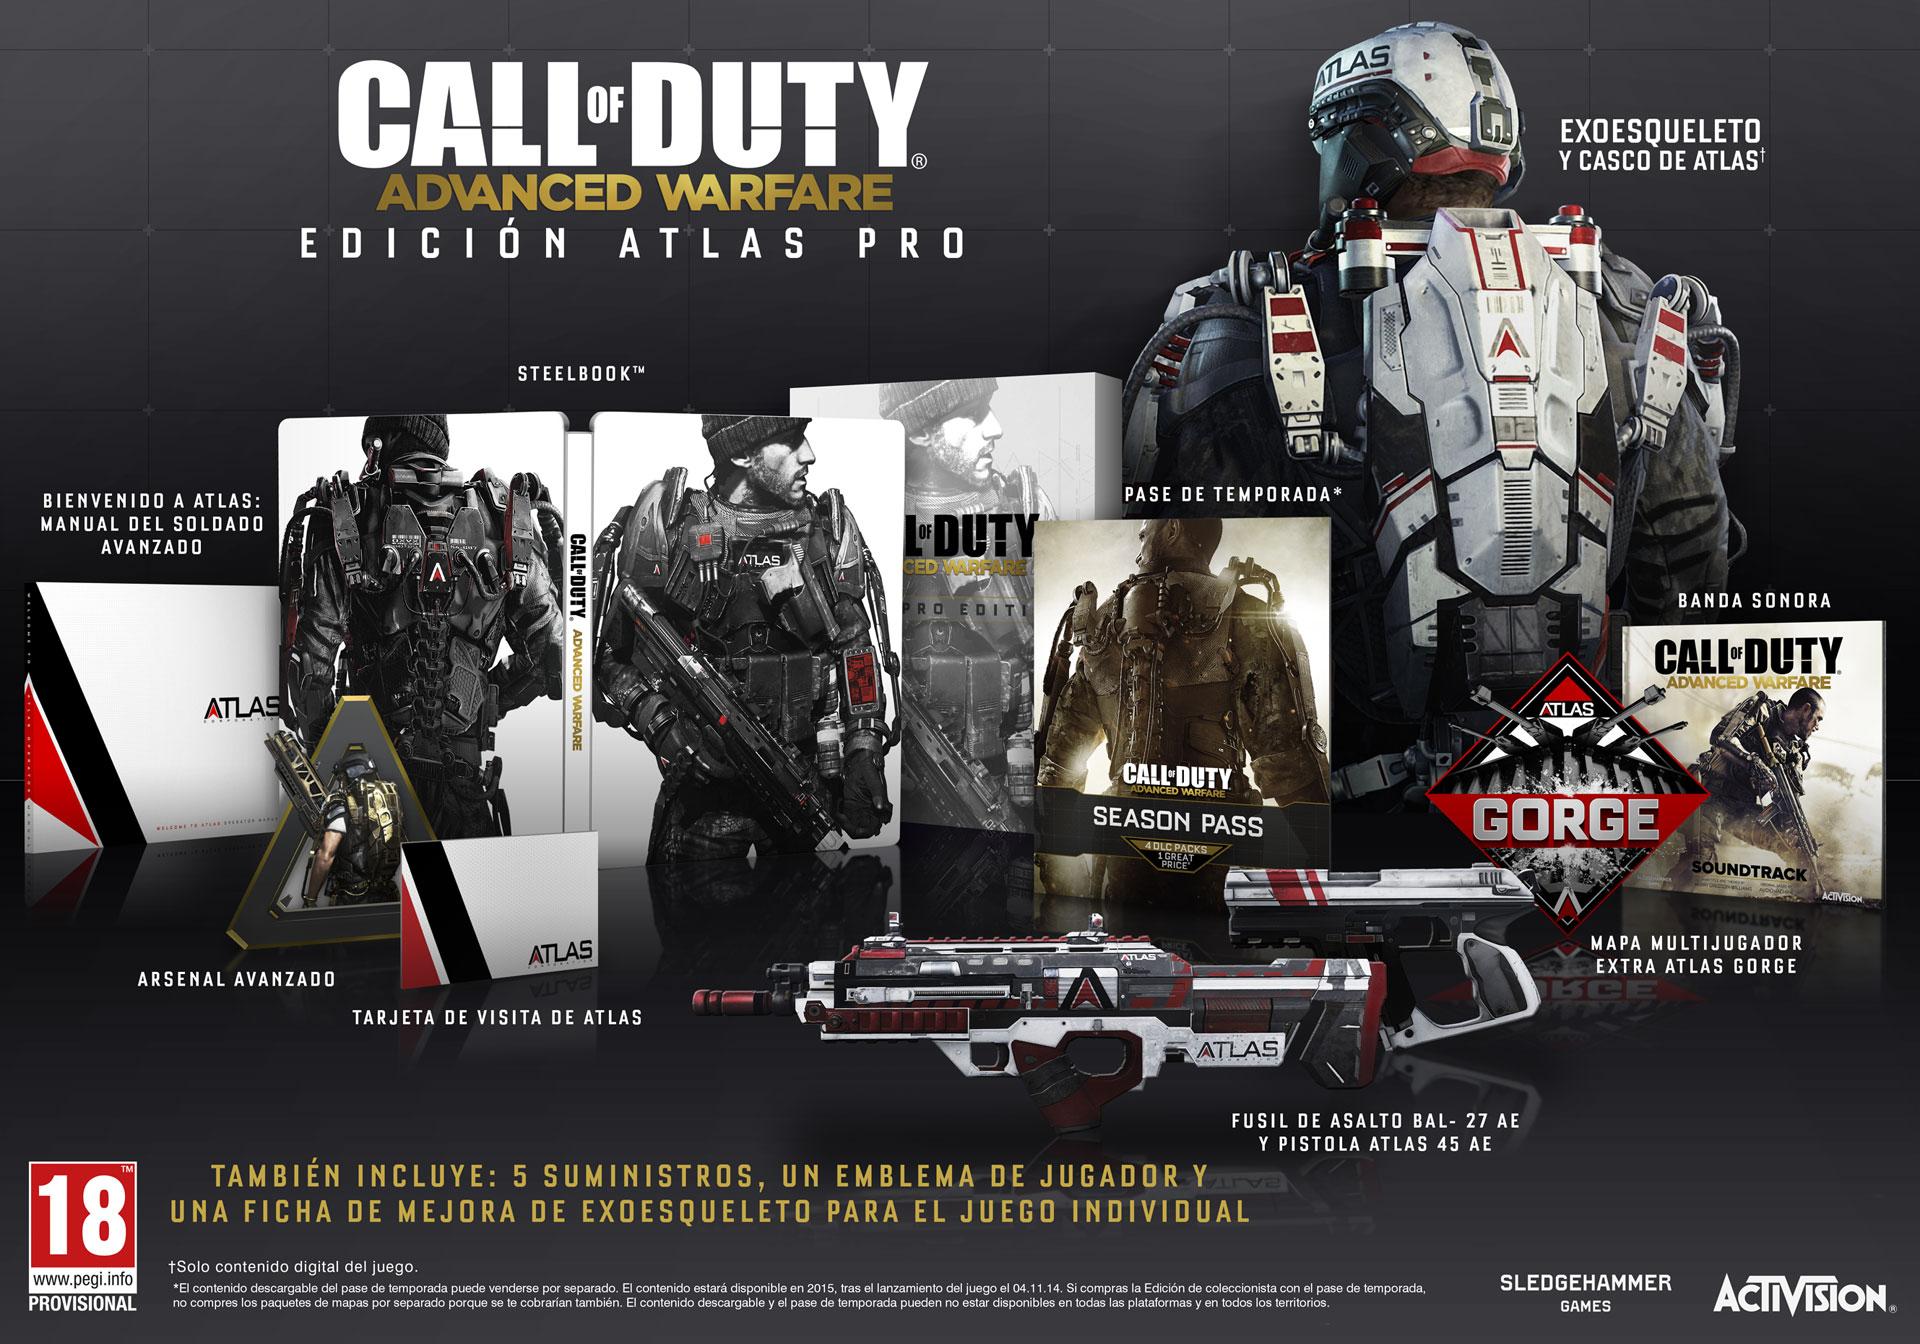 Advanced Warfare Edición Atlas Pro